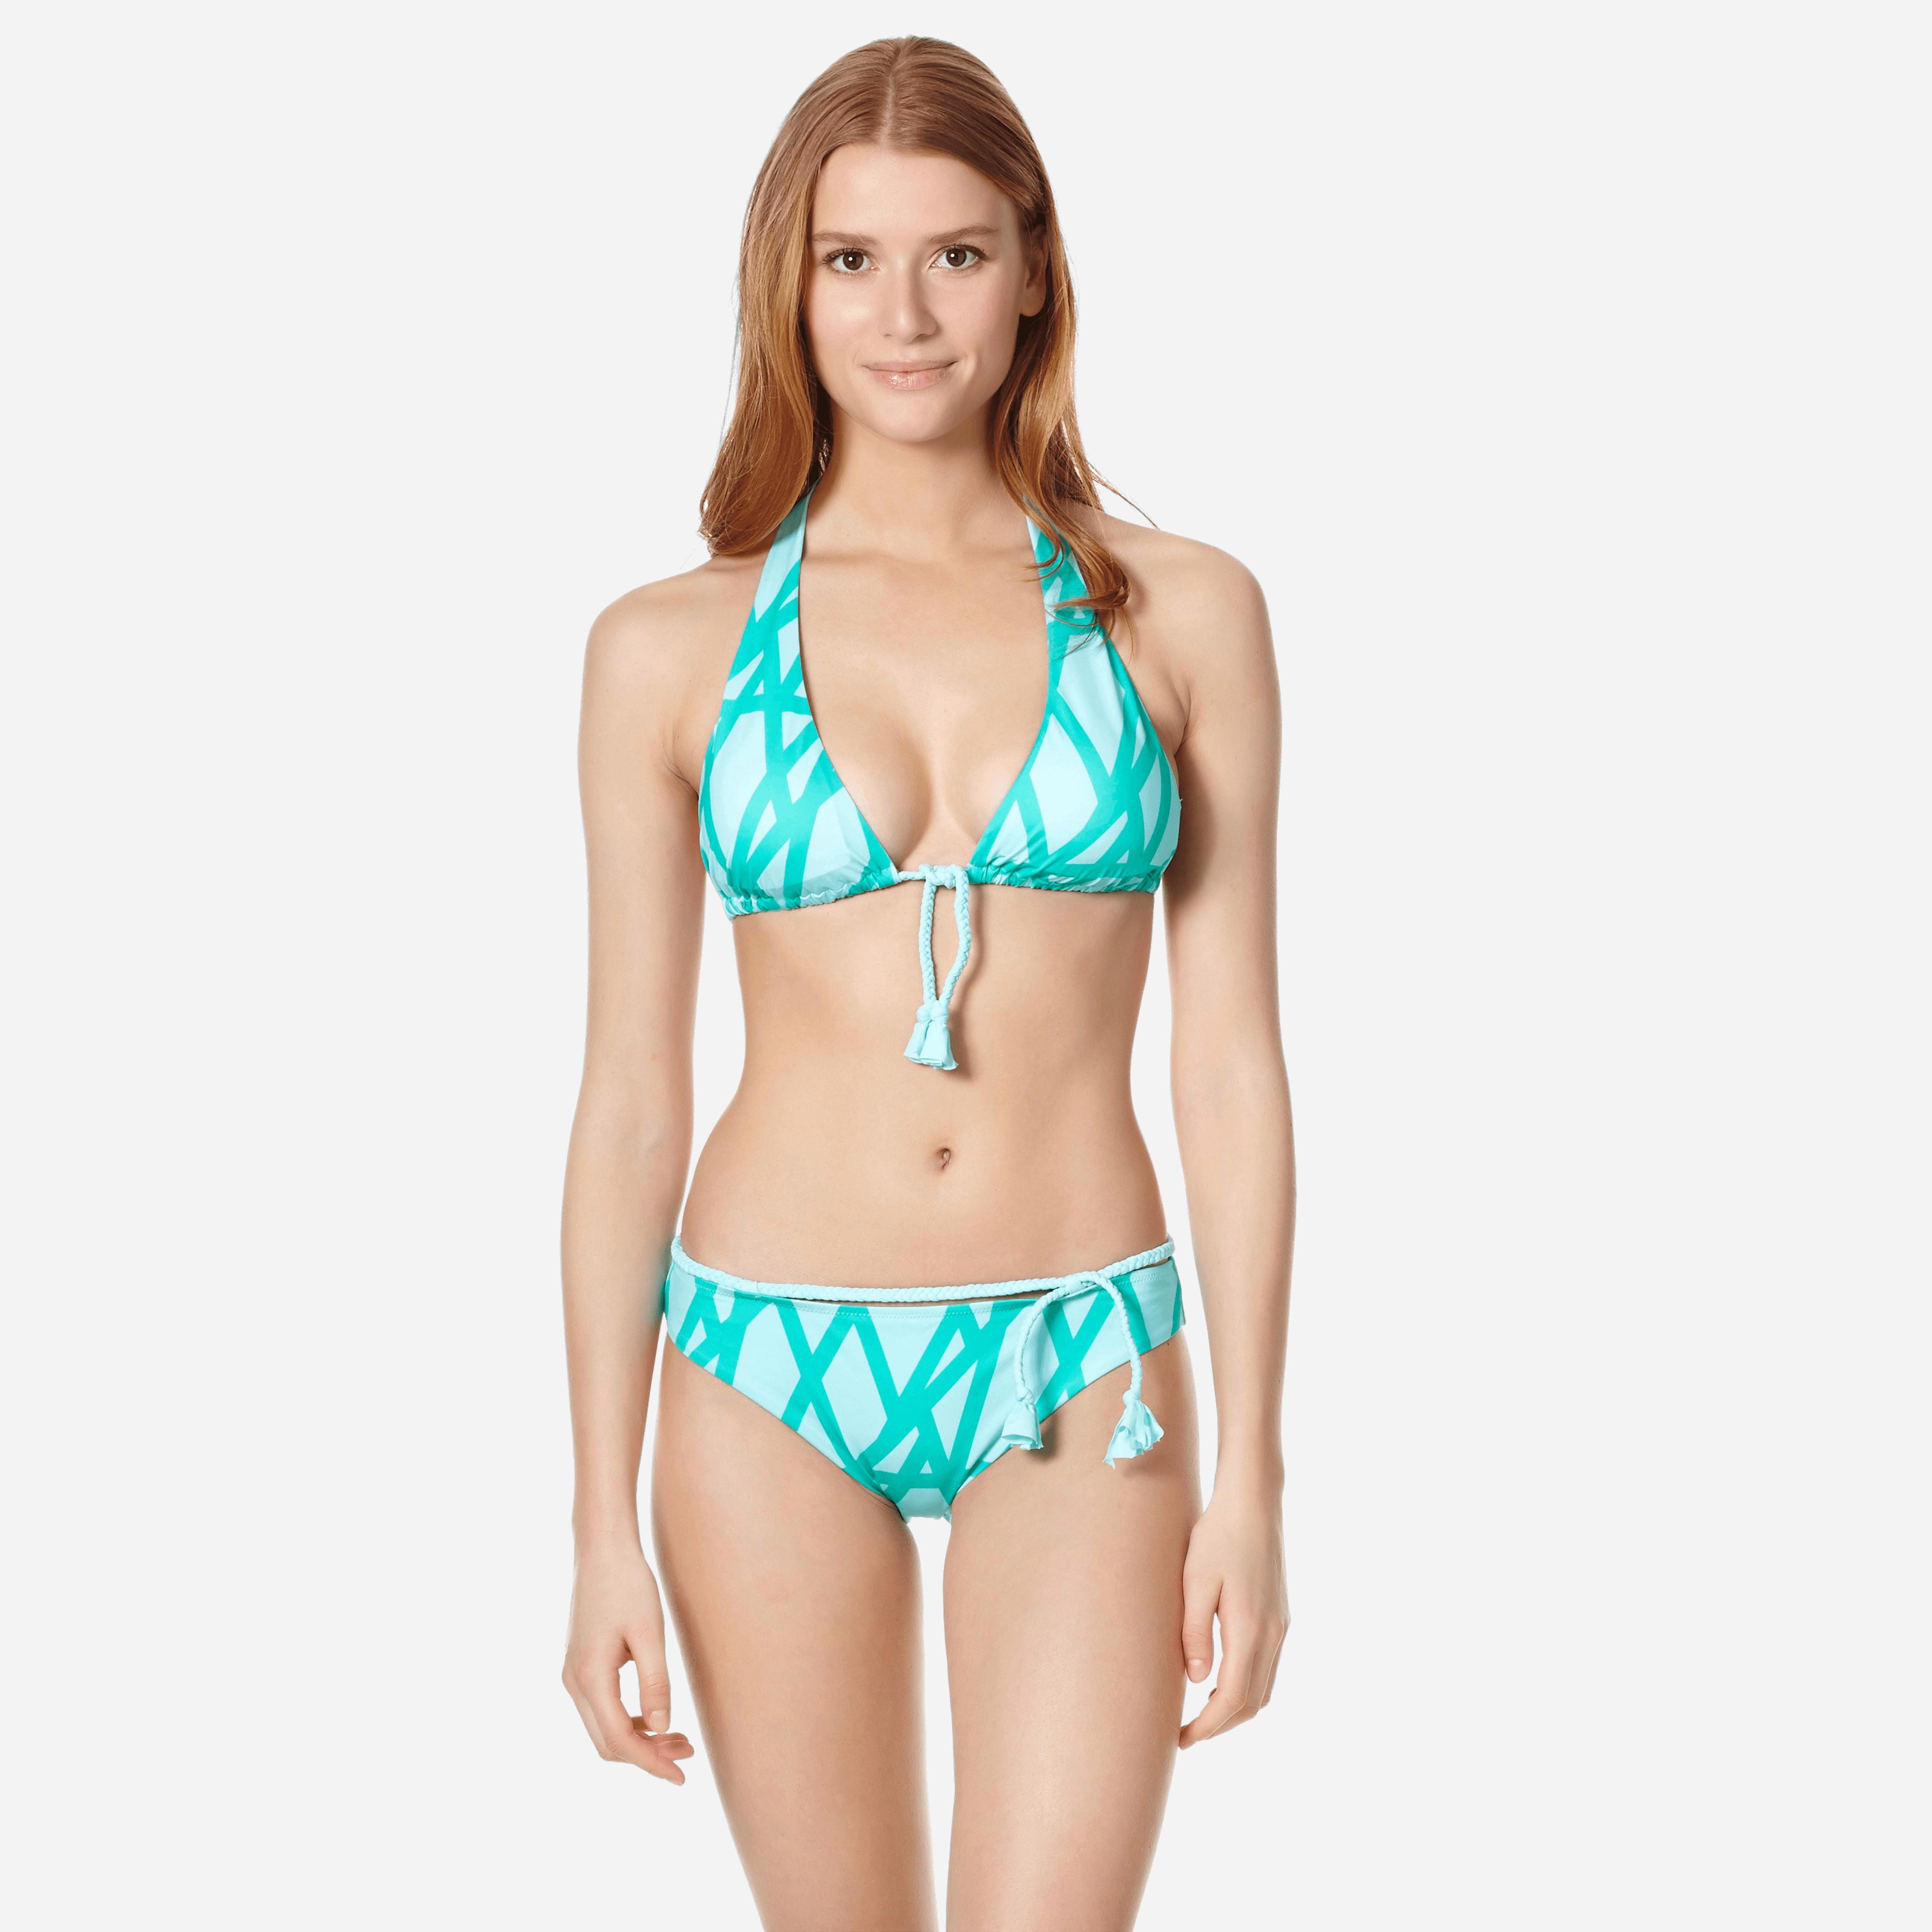 VILEBREQUIN | Women Swimwear - Women Bikini Halter Top Ribbon Bicolor - SWIMMING TRUNK - LAURYN - Green - XXS - Vilebrequin | Goxip